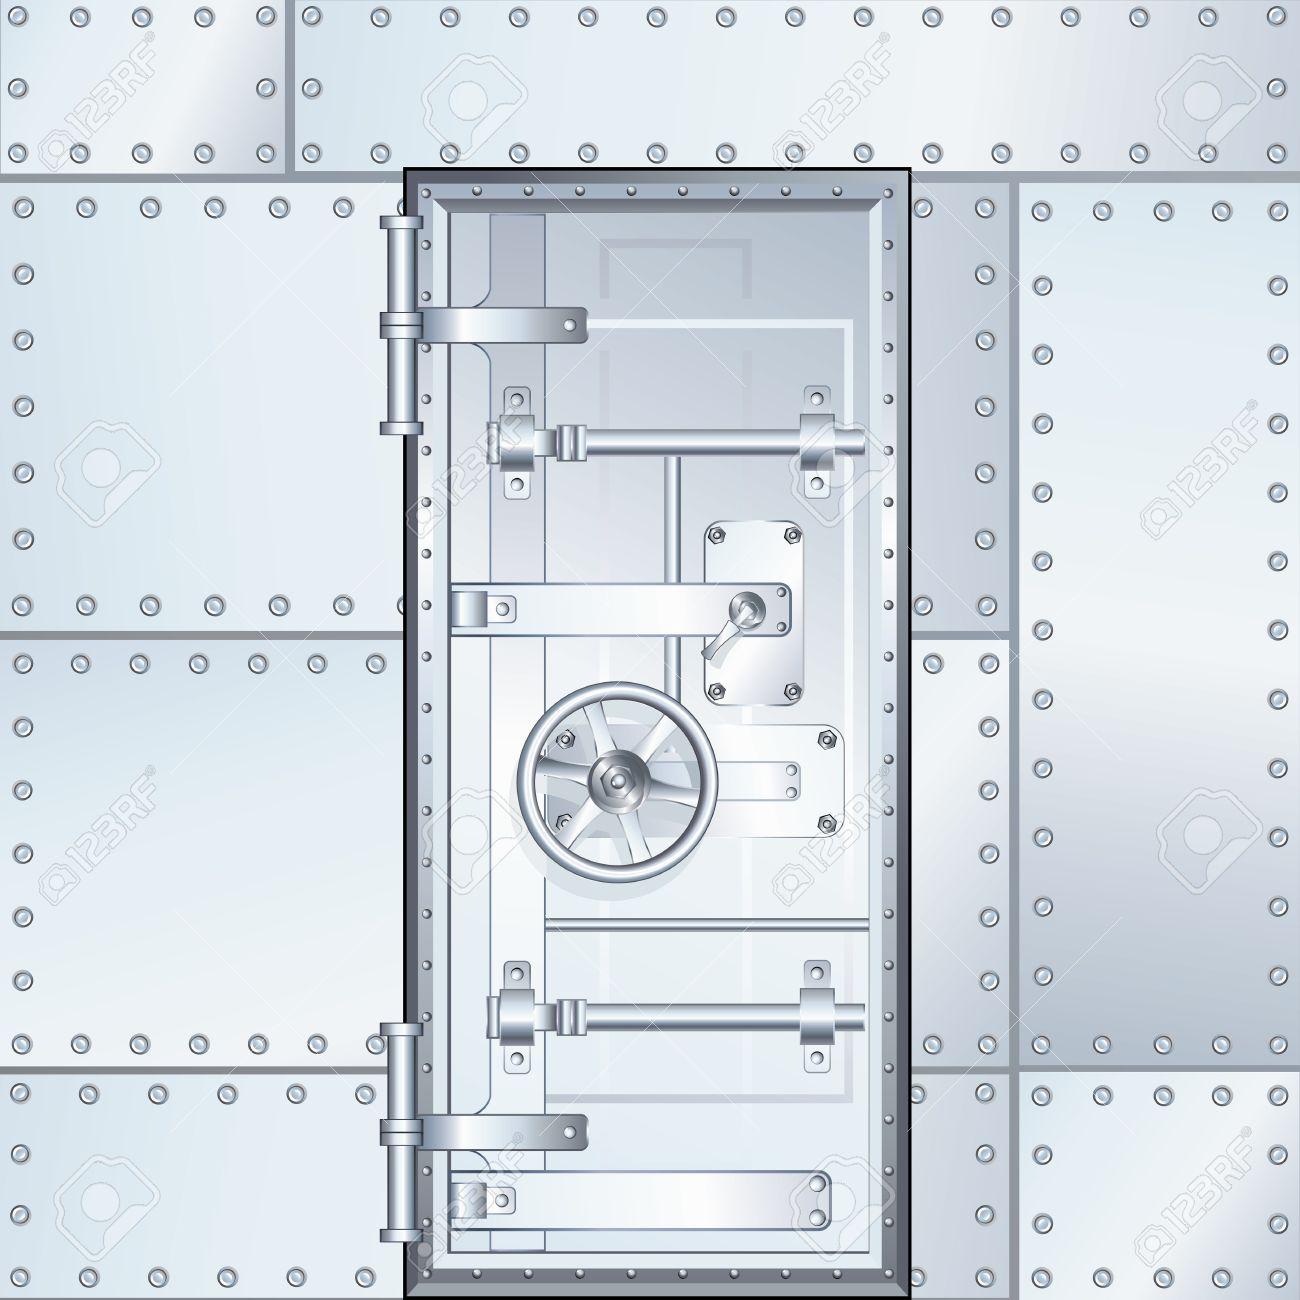 Closed Door Drawing closed bank vault door. vector design illustration royalty free